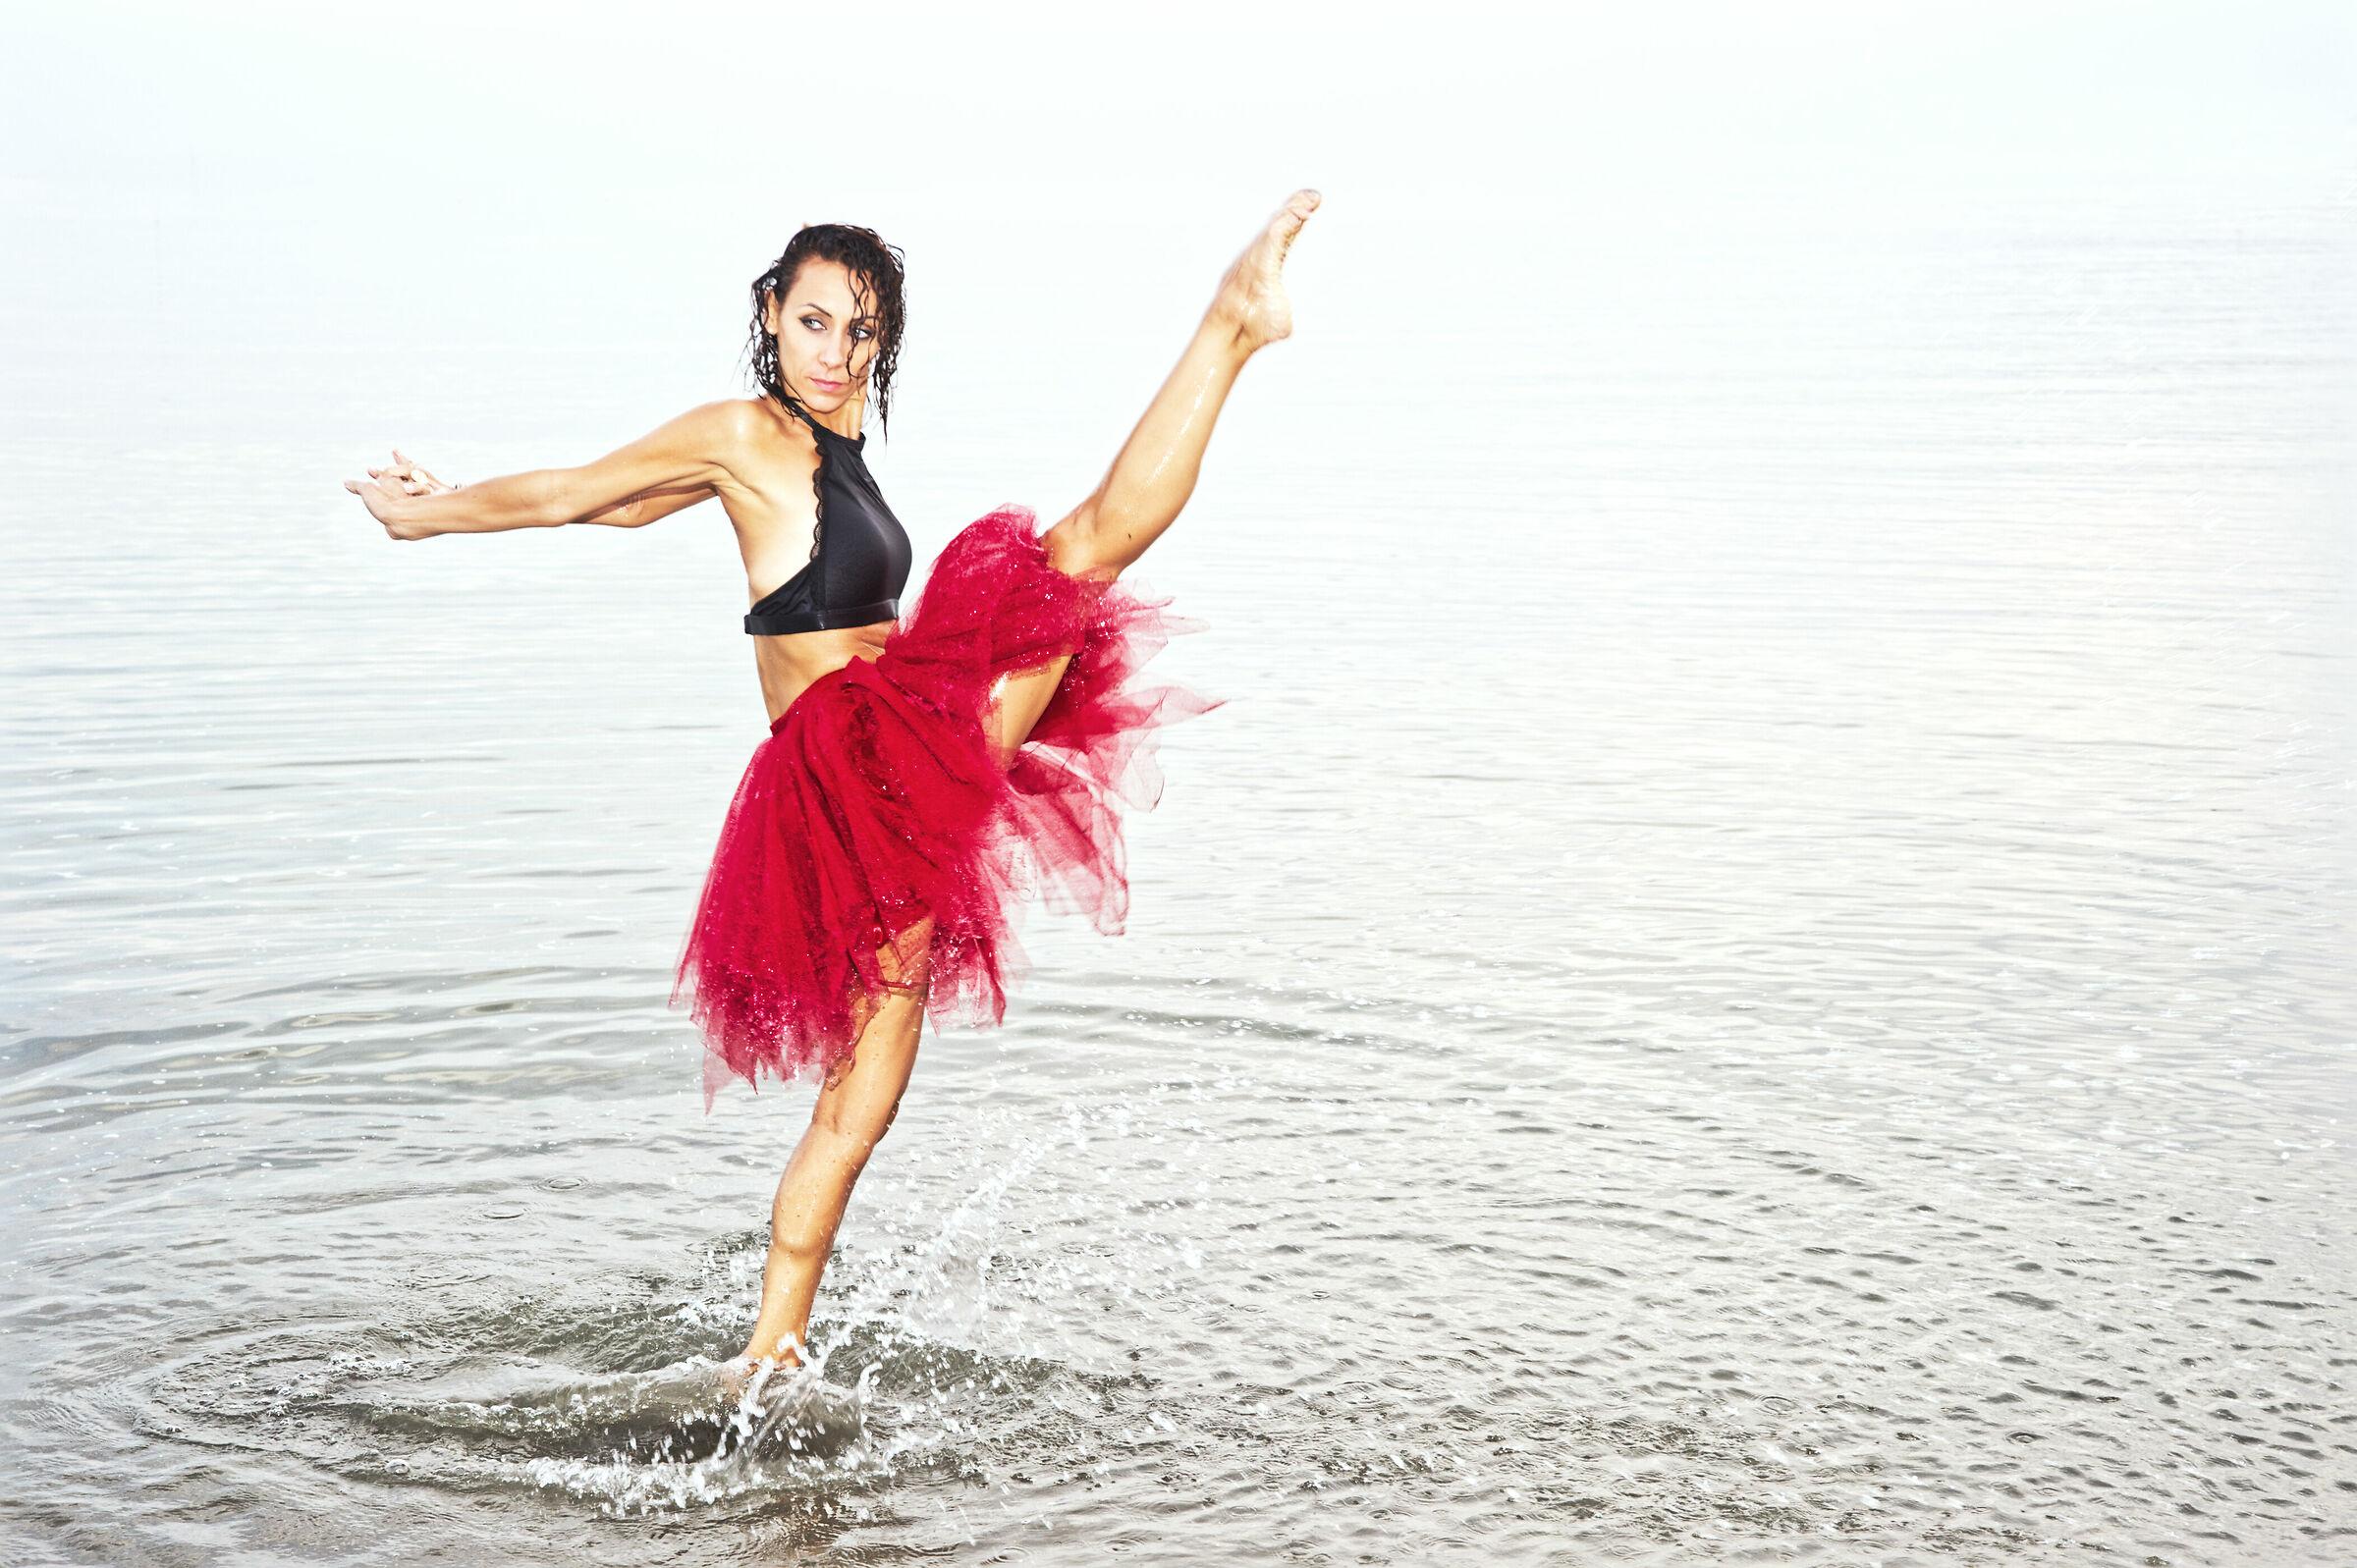 The Mermaid Dance...